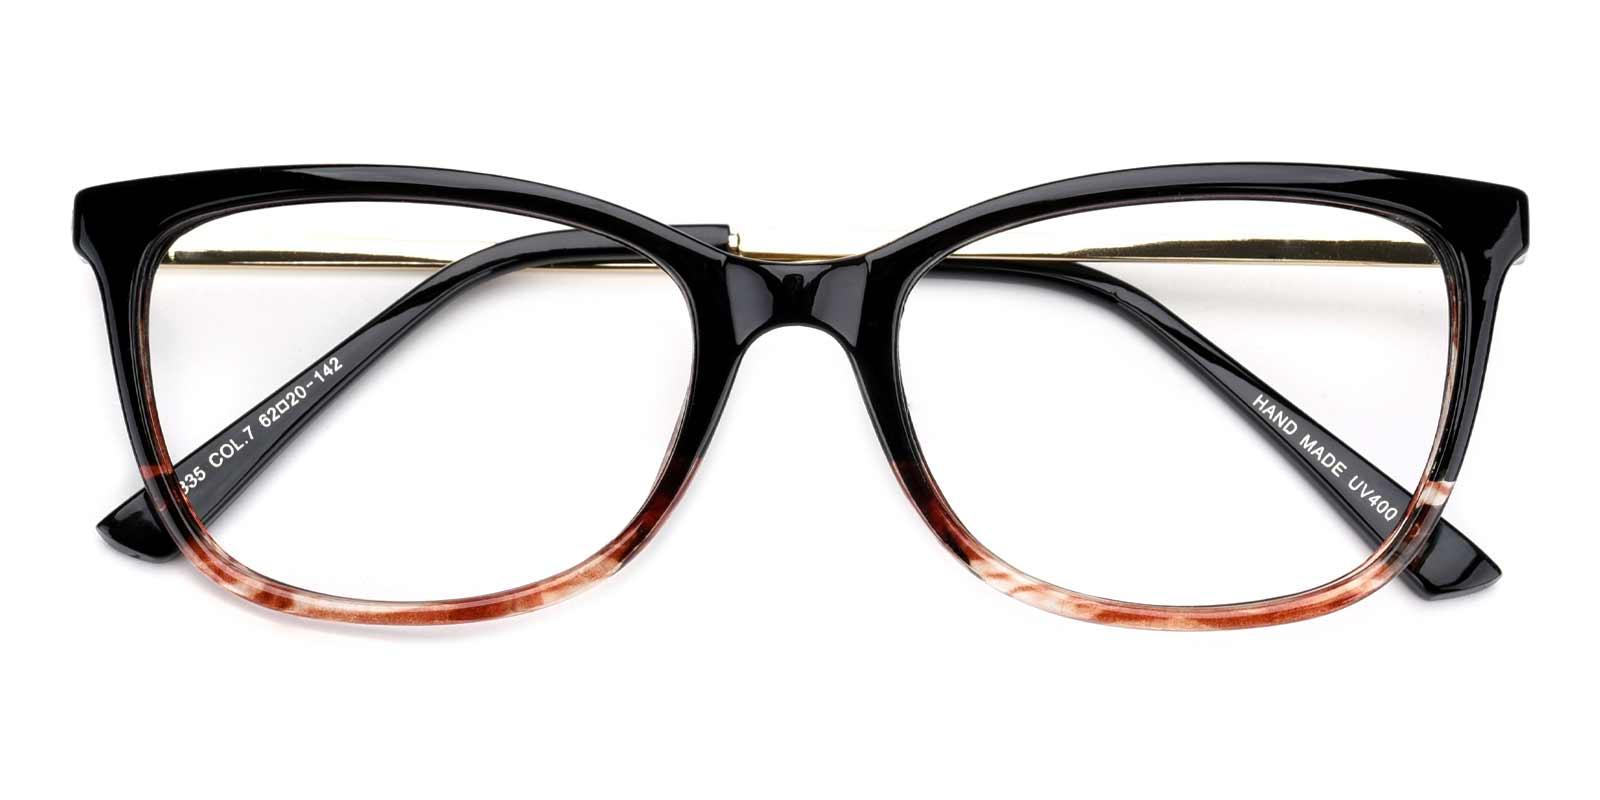 Monica-Tortoise-Rectangle-Acetate-Eyeglasses-detail